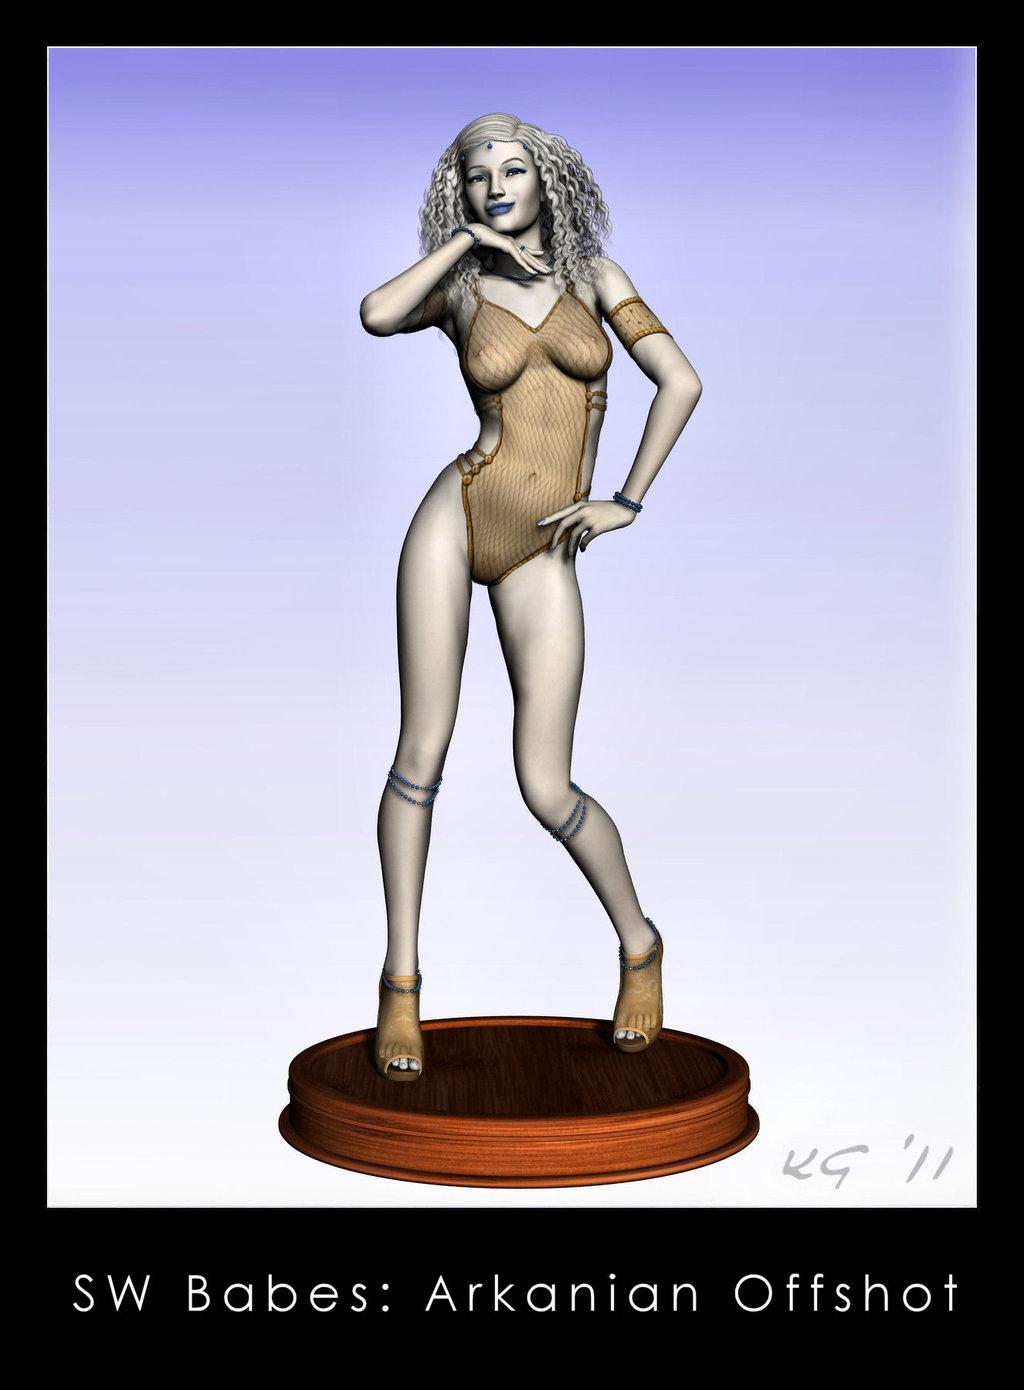 wars women star of nude Persona 5 justine and caroline hentai